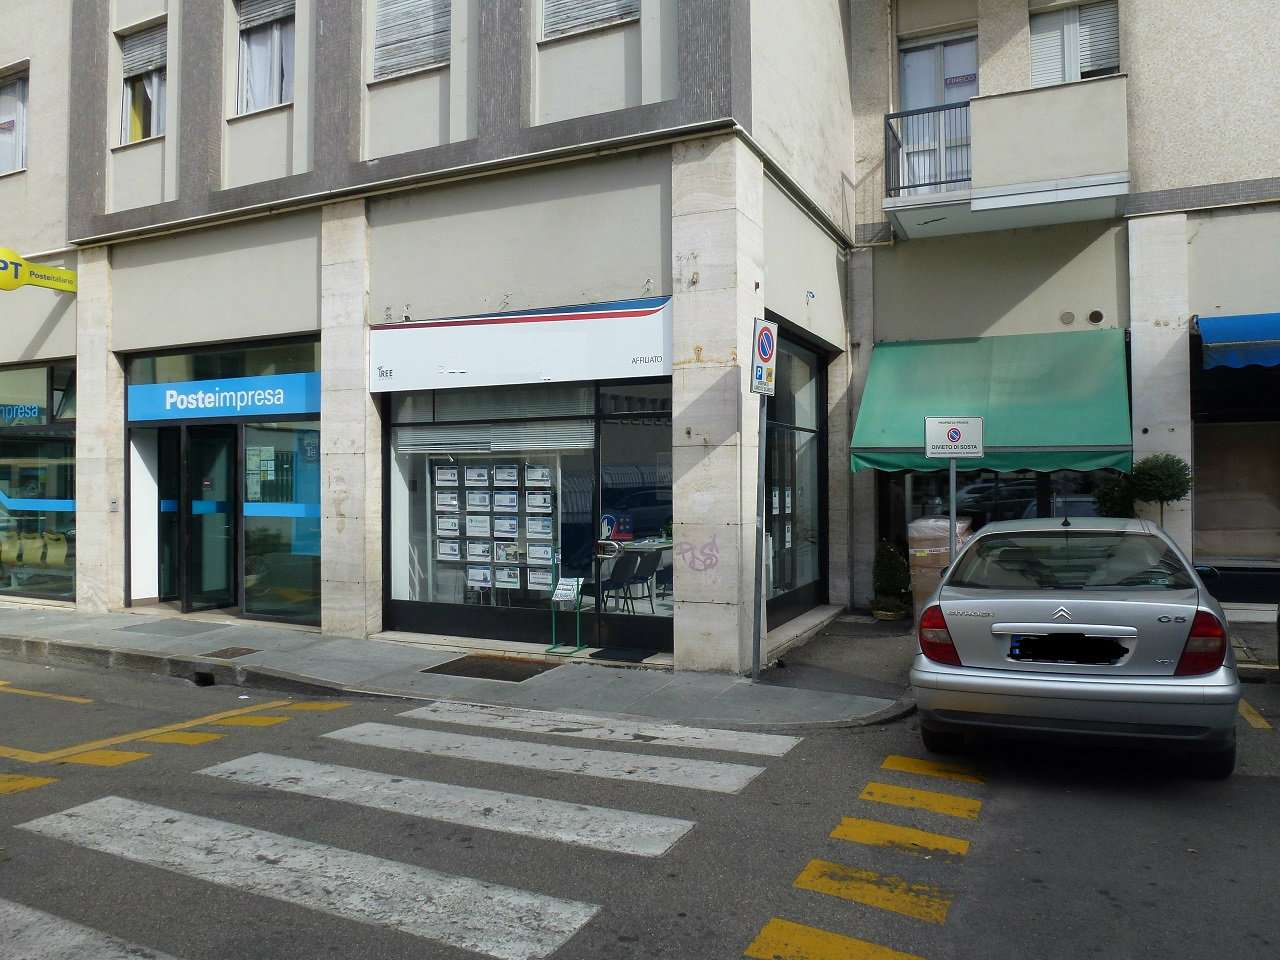 Immobile Commerciale in vendita a Vercelli-http://media.getrix.it/1/6846/2577364739.jpg